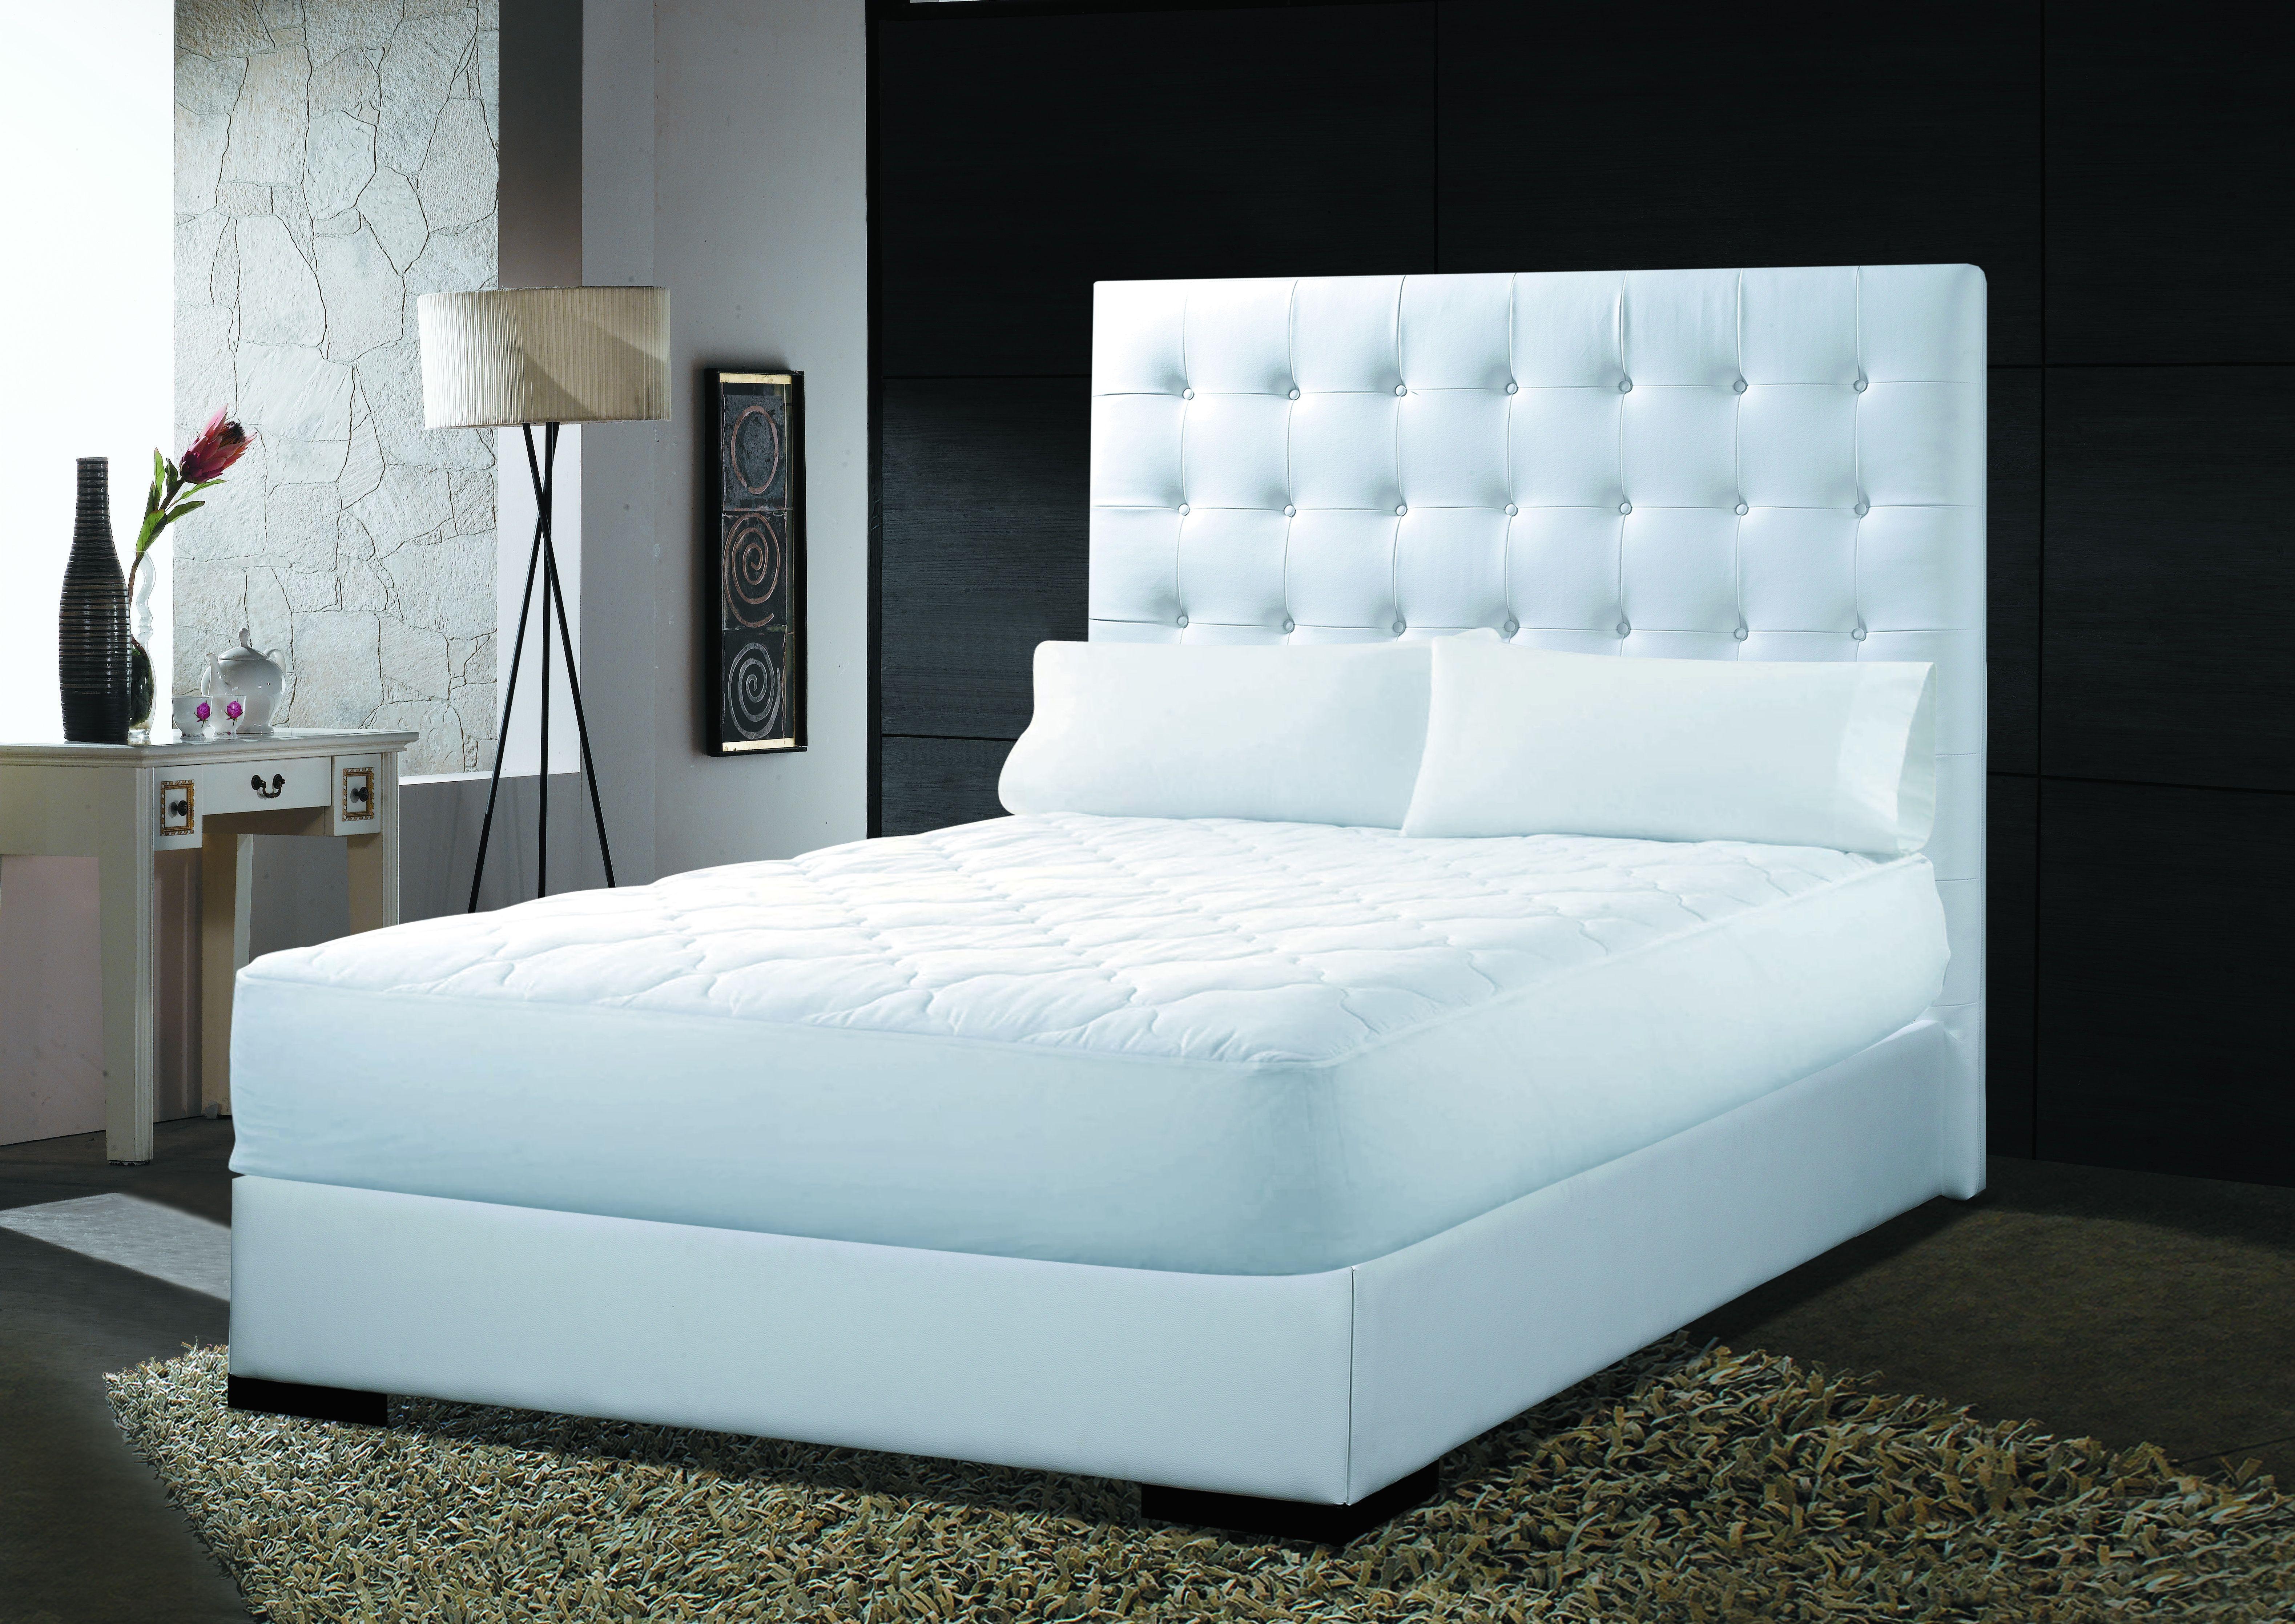 Designer Beds modern designer italian beds | storage | leather & fabric | denelli